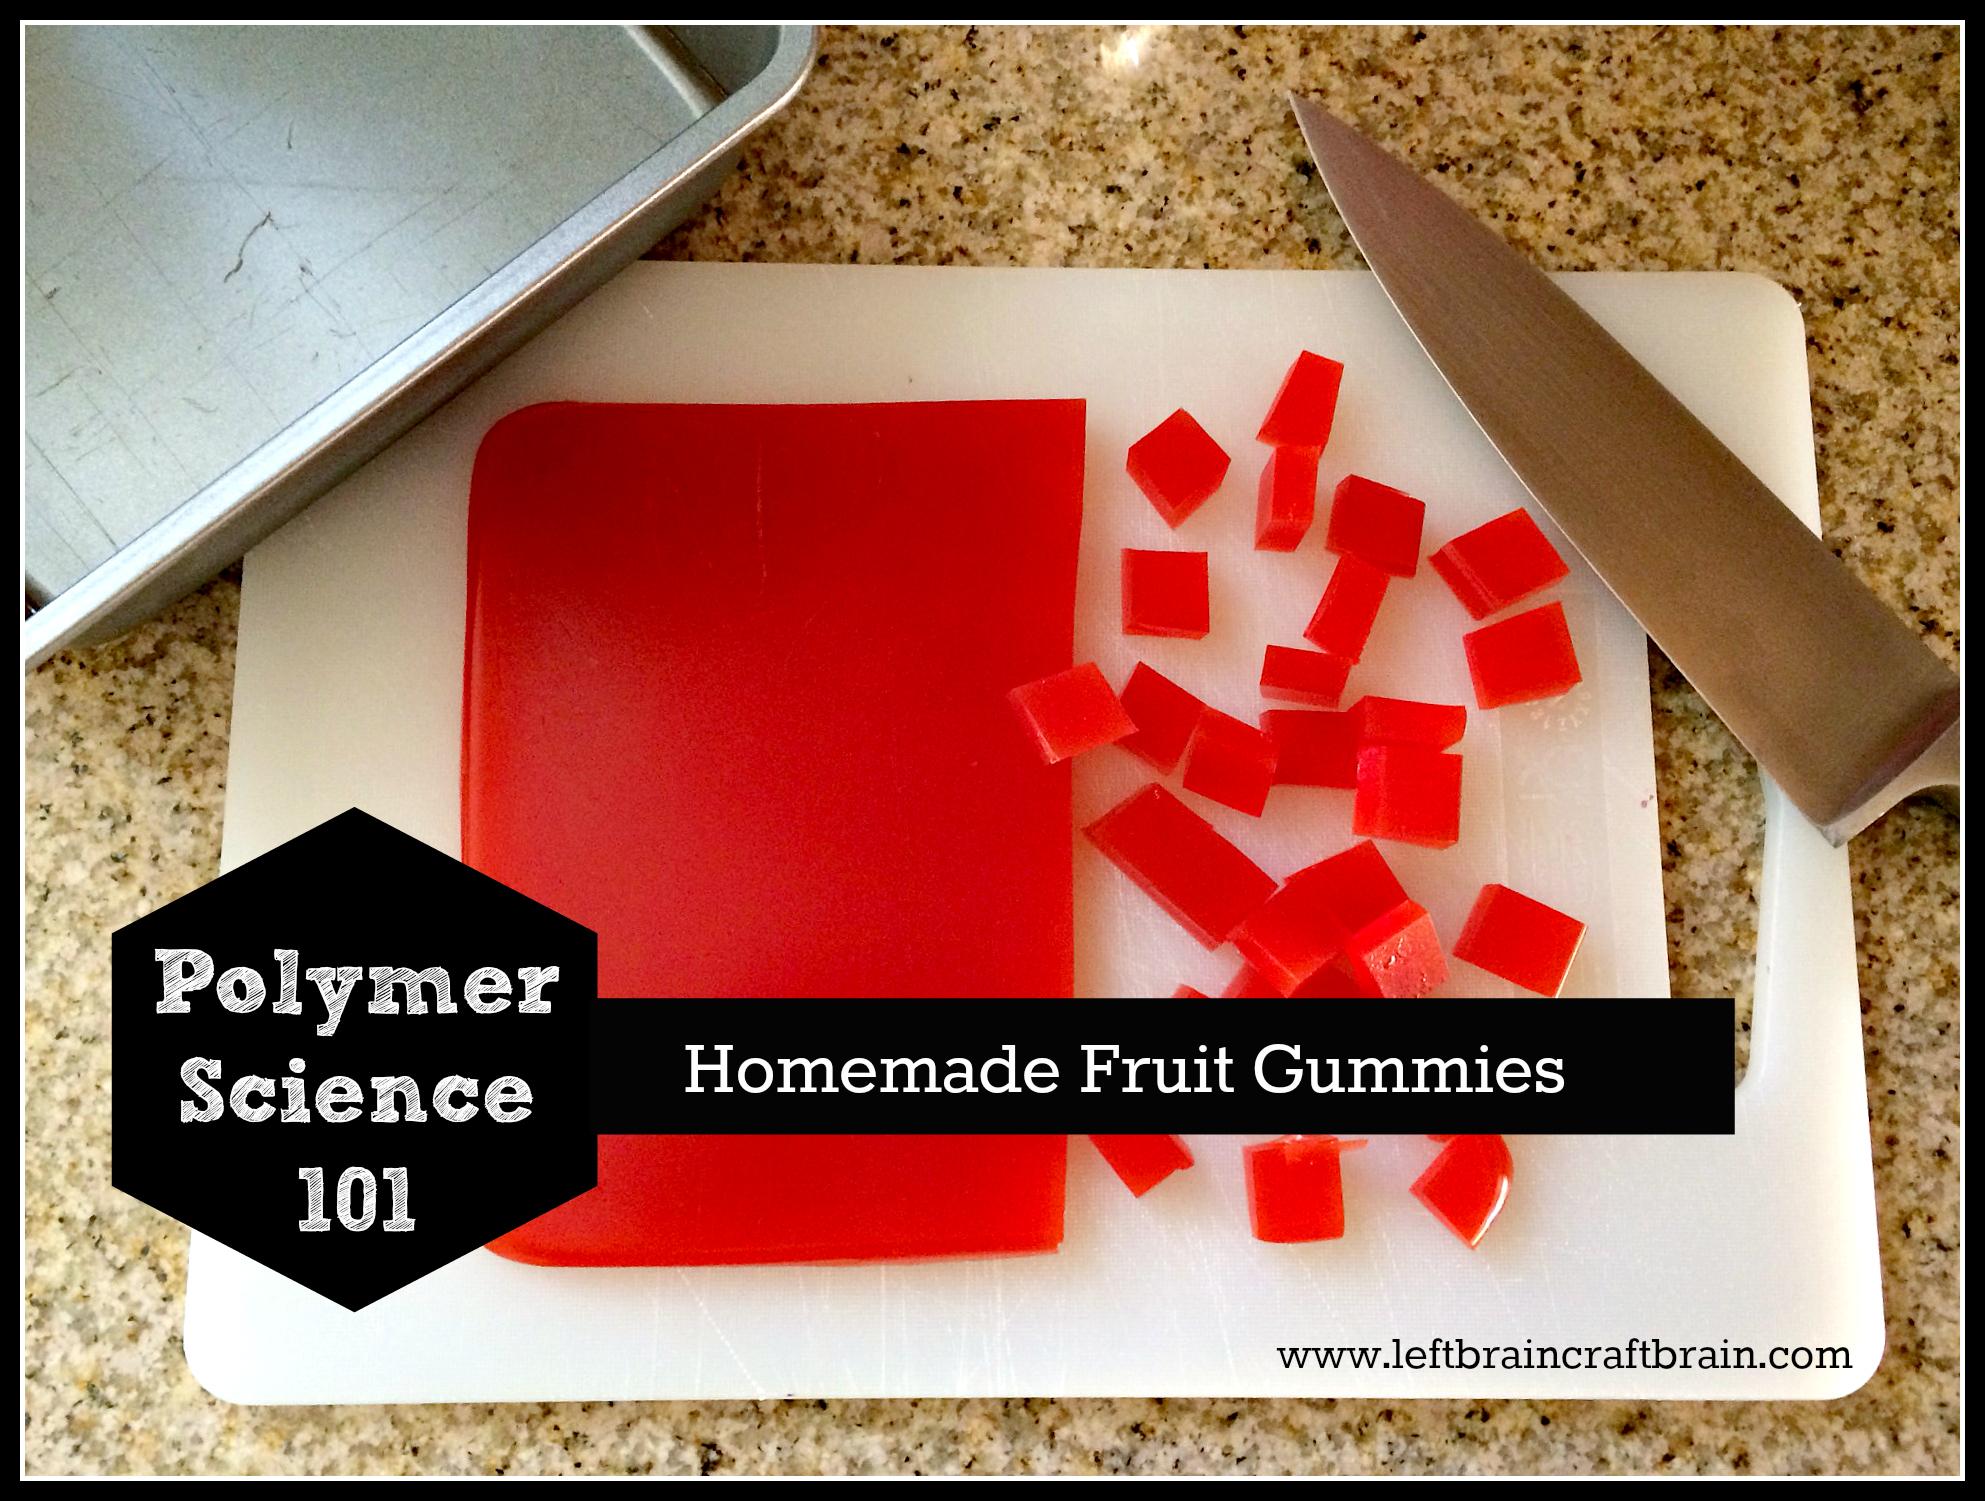 Polymer Science: Homemade Fruit Gummies - Left Brain Craft Brain